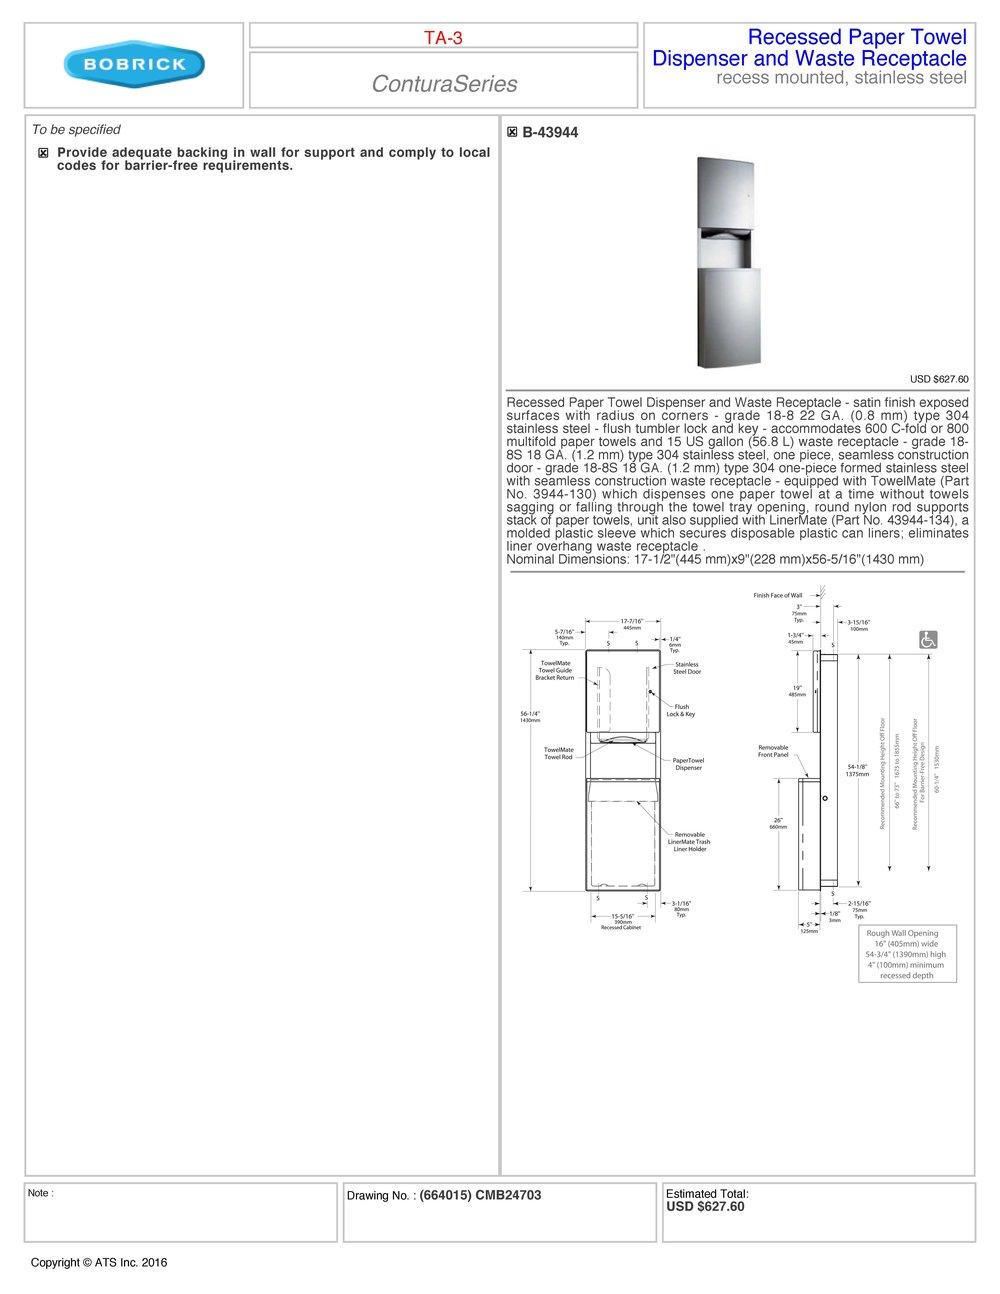 Pharmaceutical Building Cutsheets_Page_08.jpg